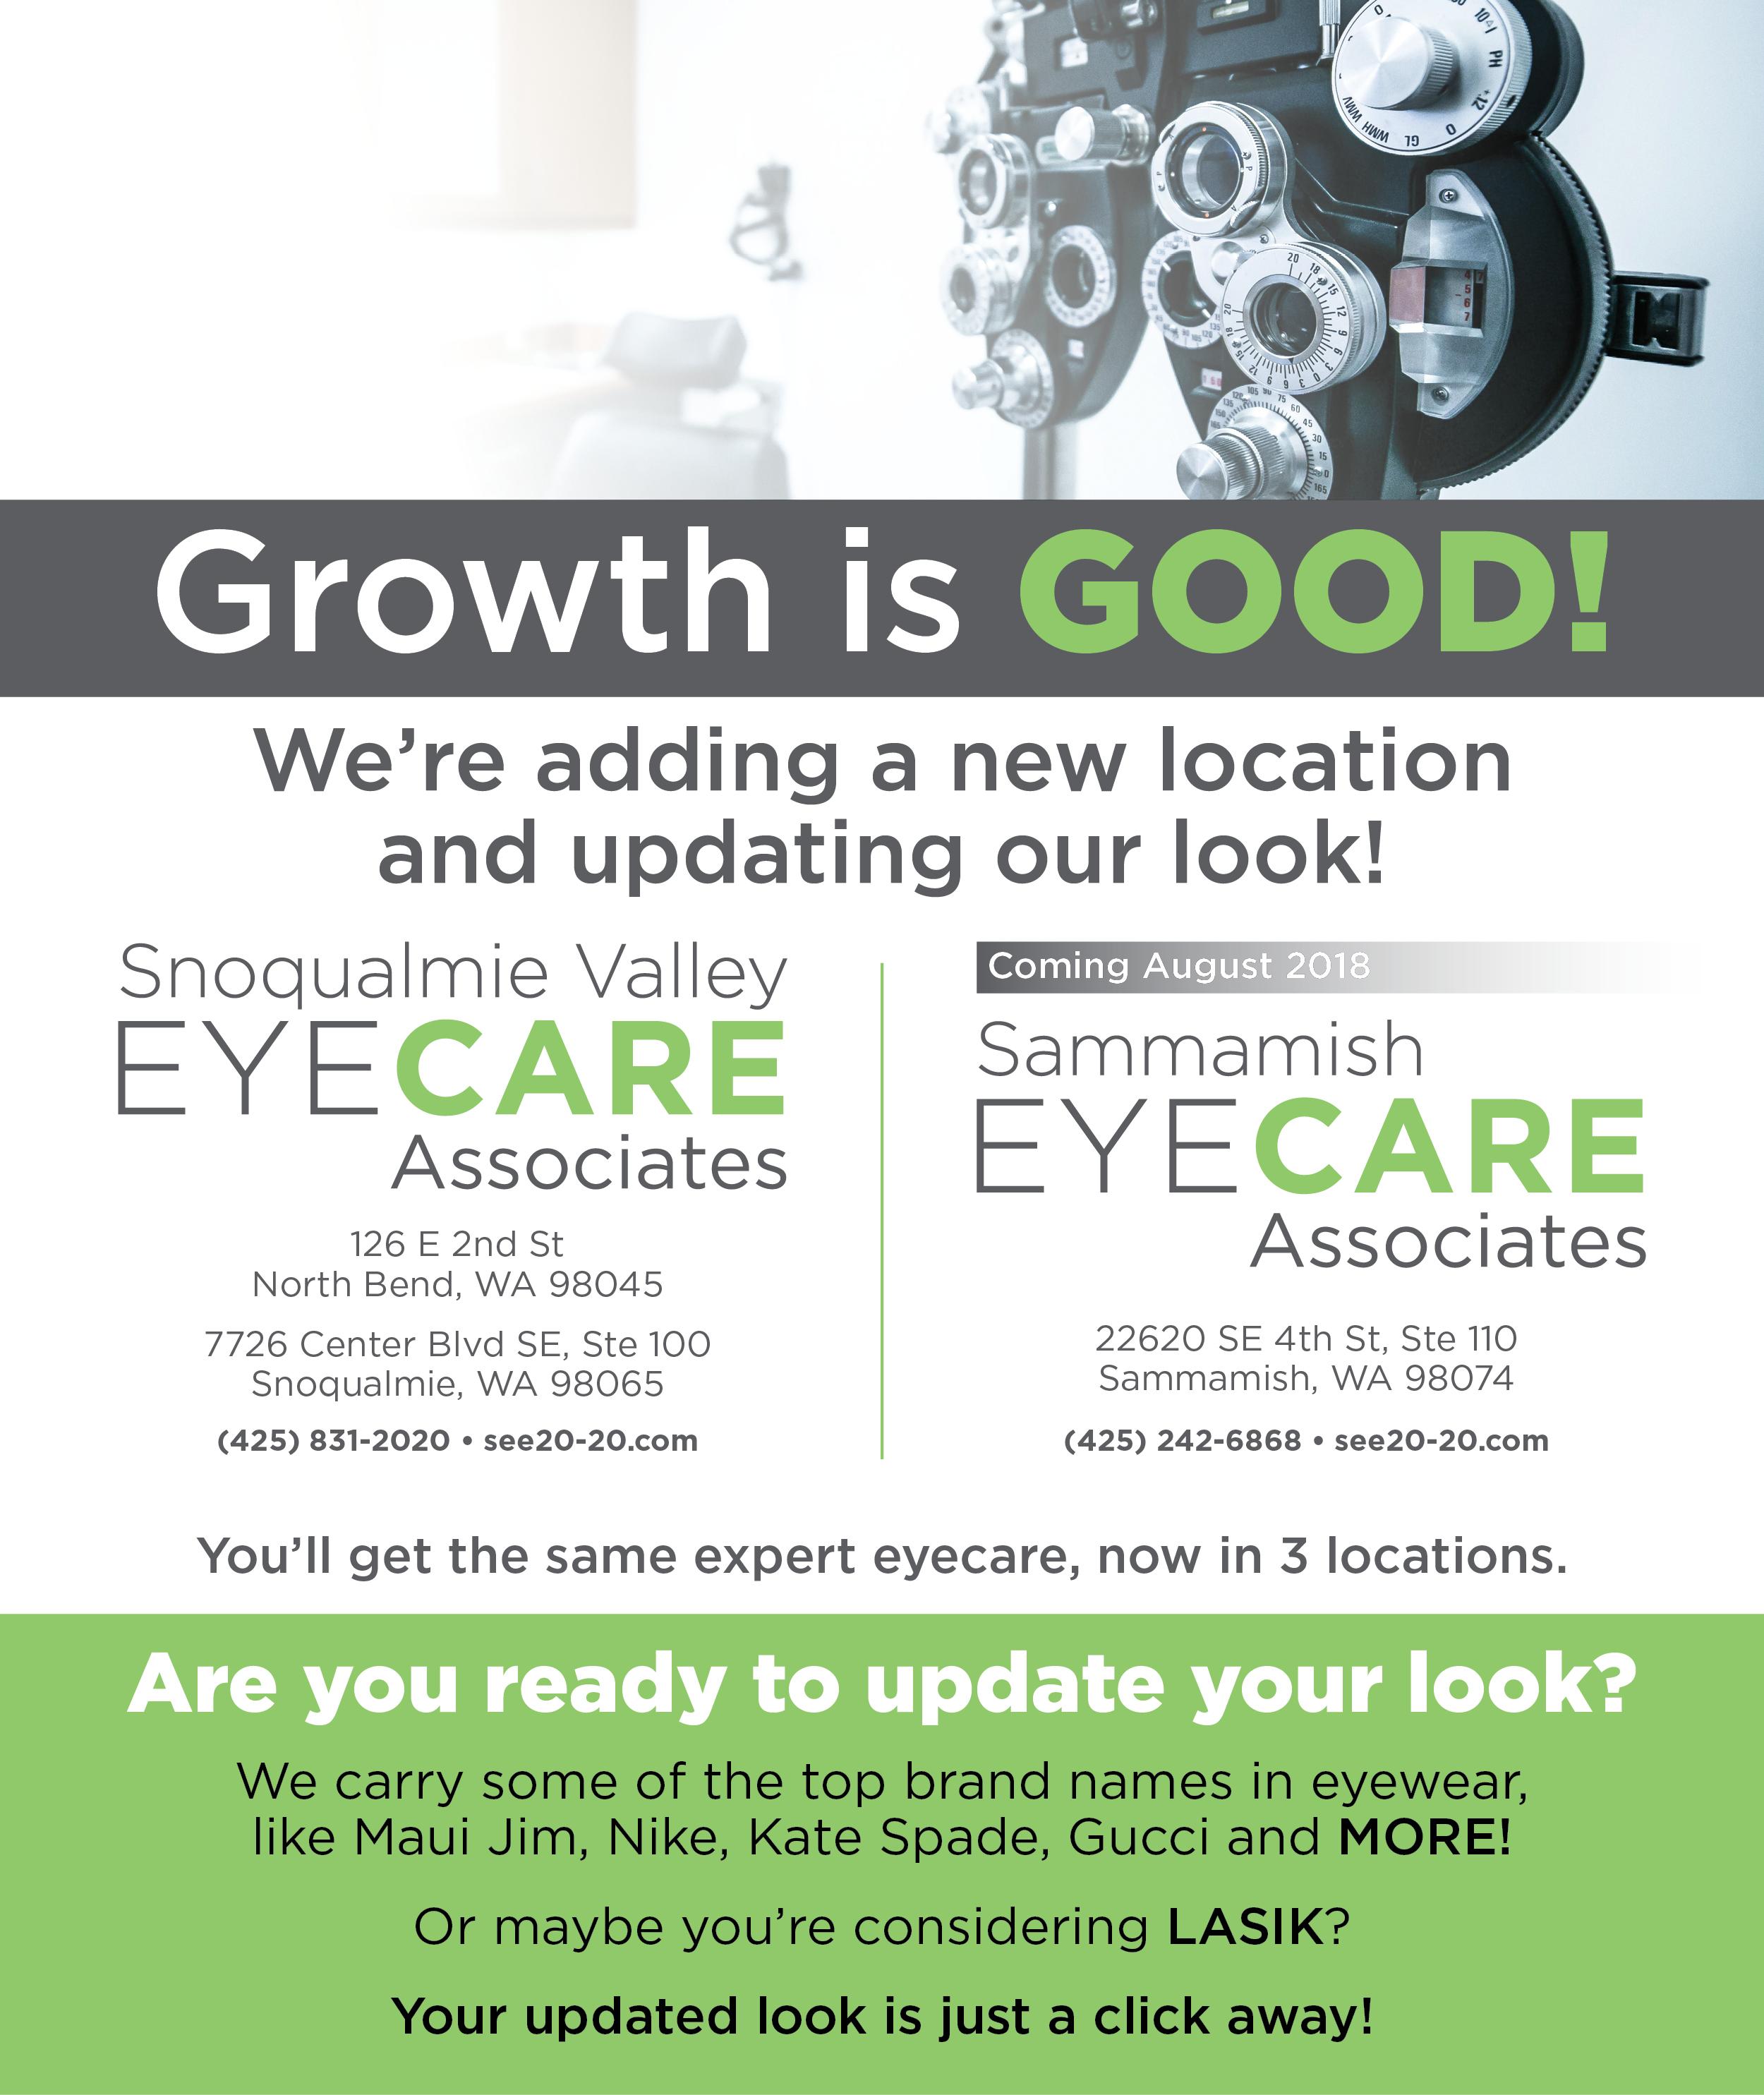 frg EyeCARE Associates